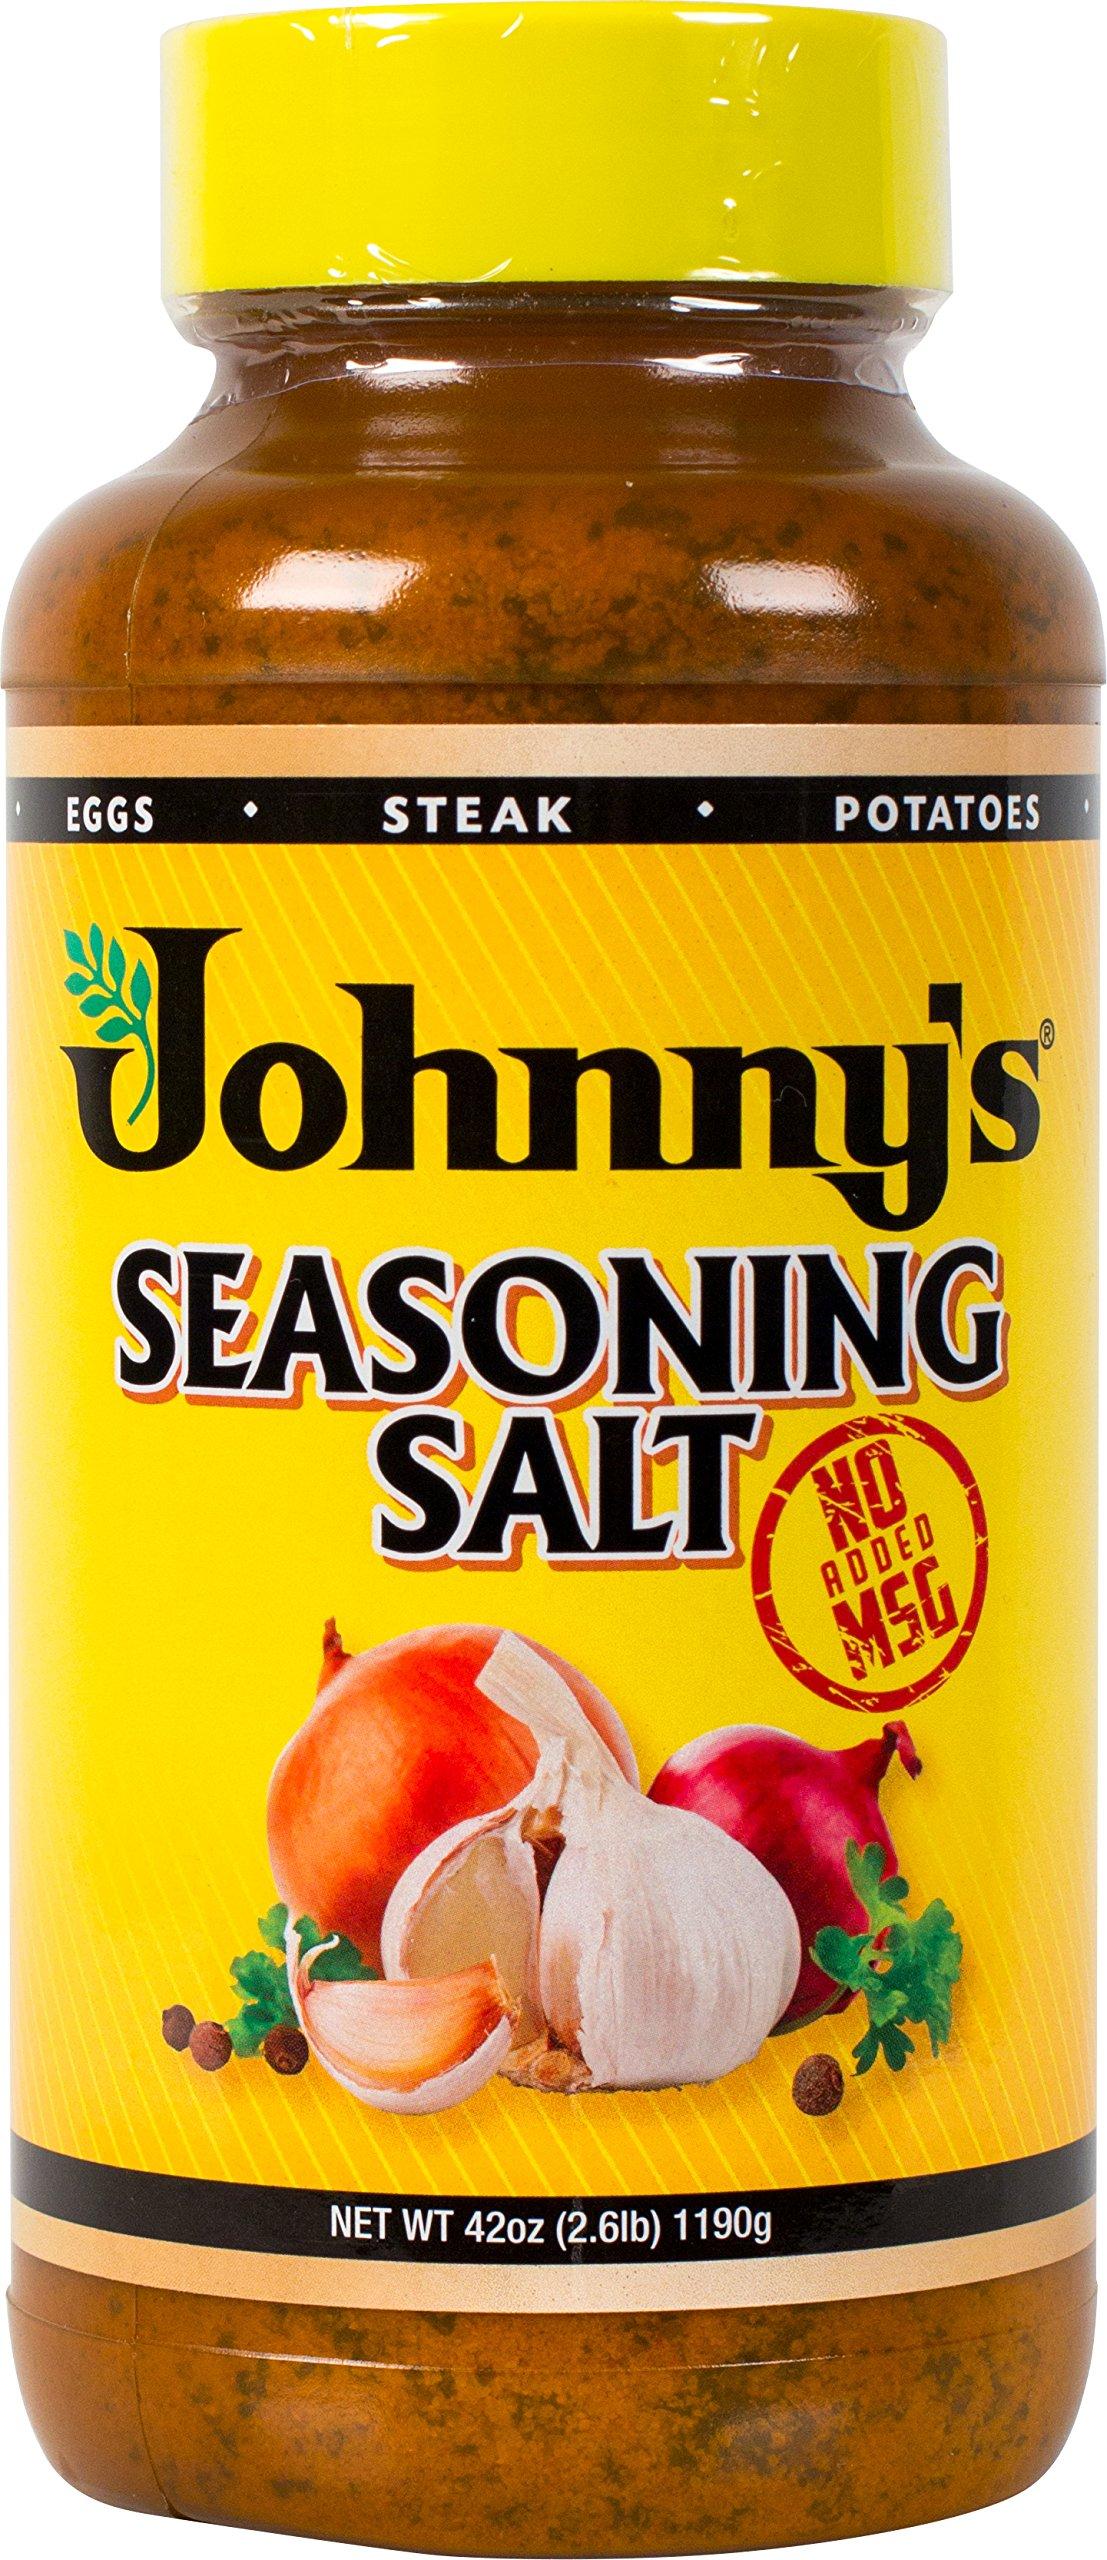 Johnny's seasoning salt, No Msg, 42 Oz